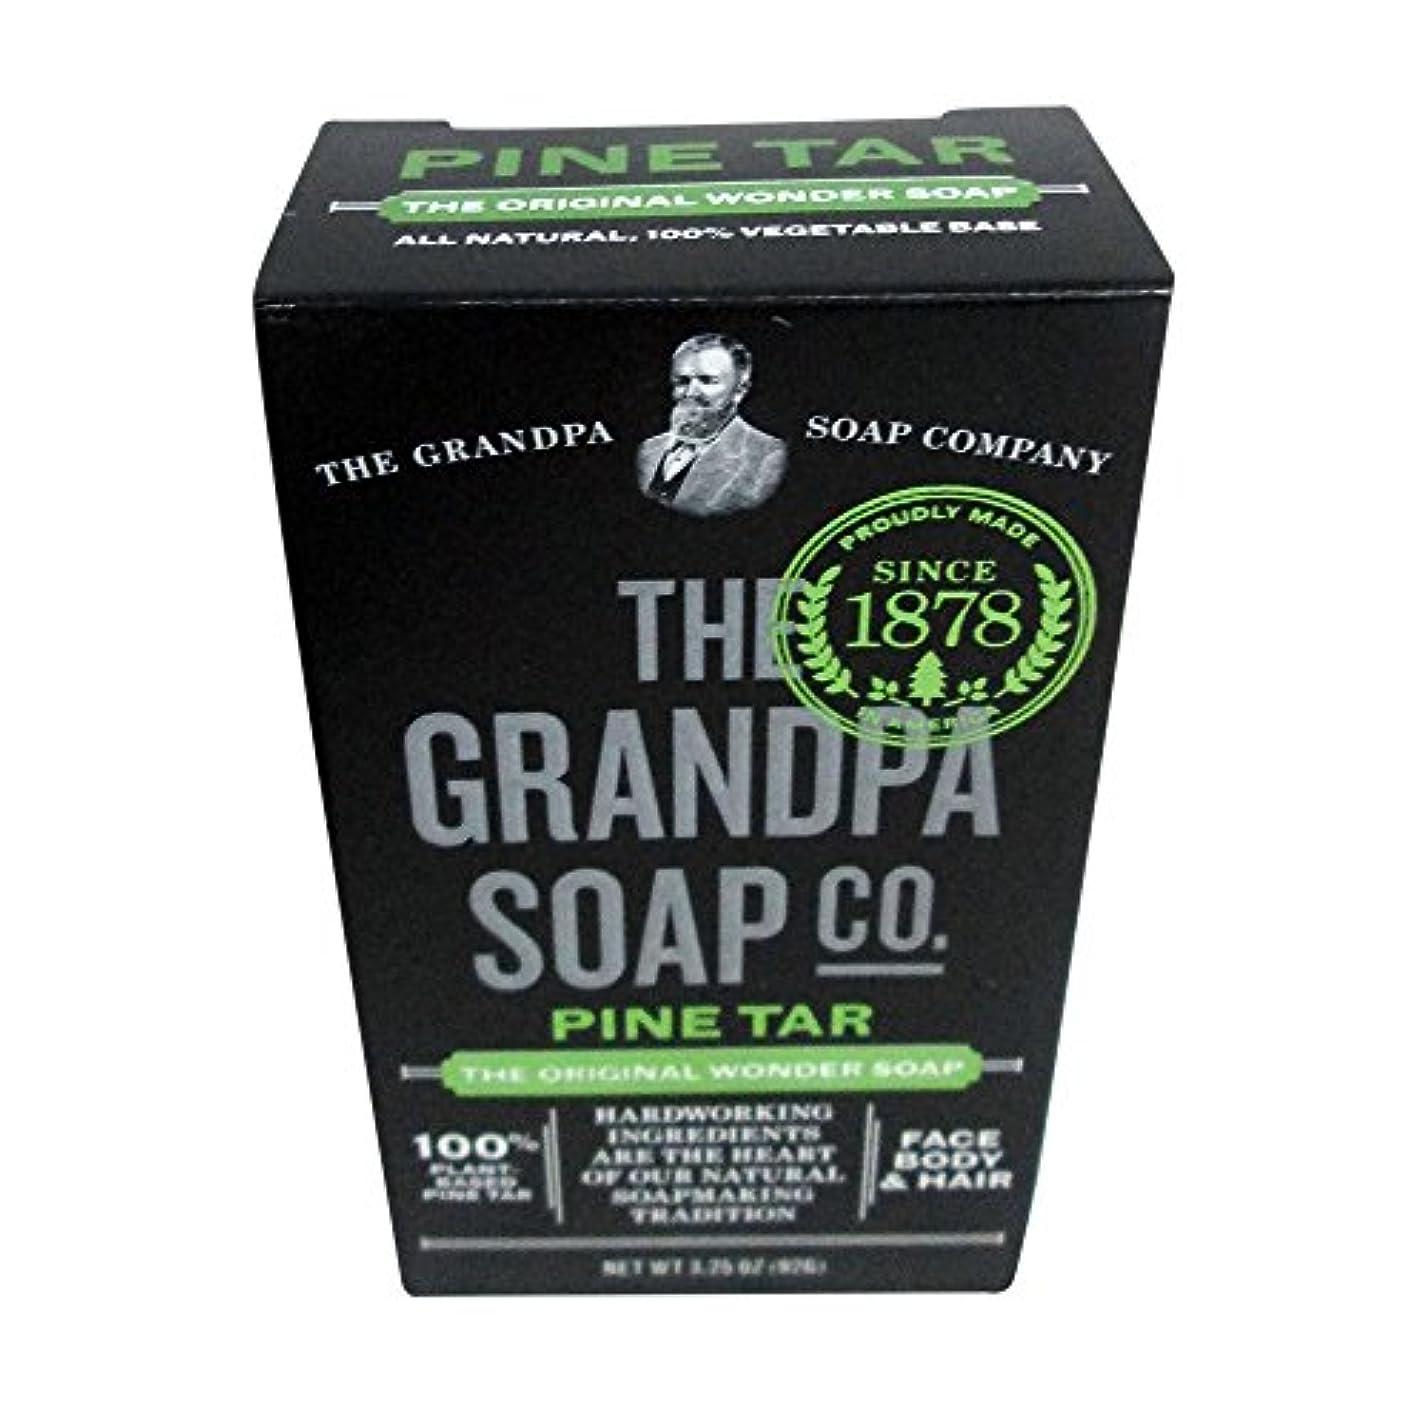 Pine Tar Soap - 3.25 oz Bar (6 Pack) by Grandpa's